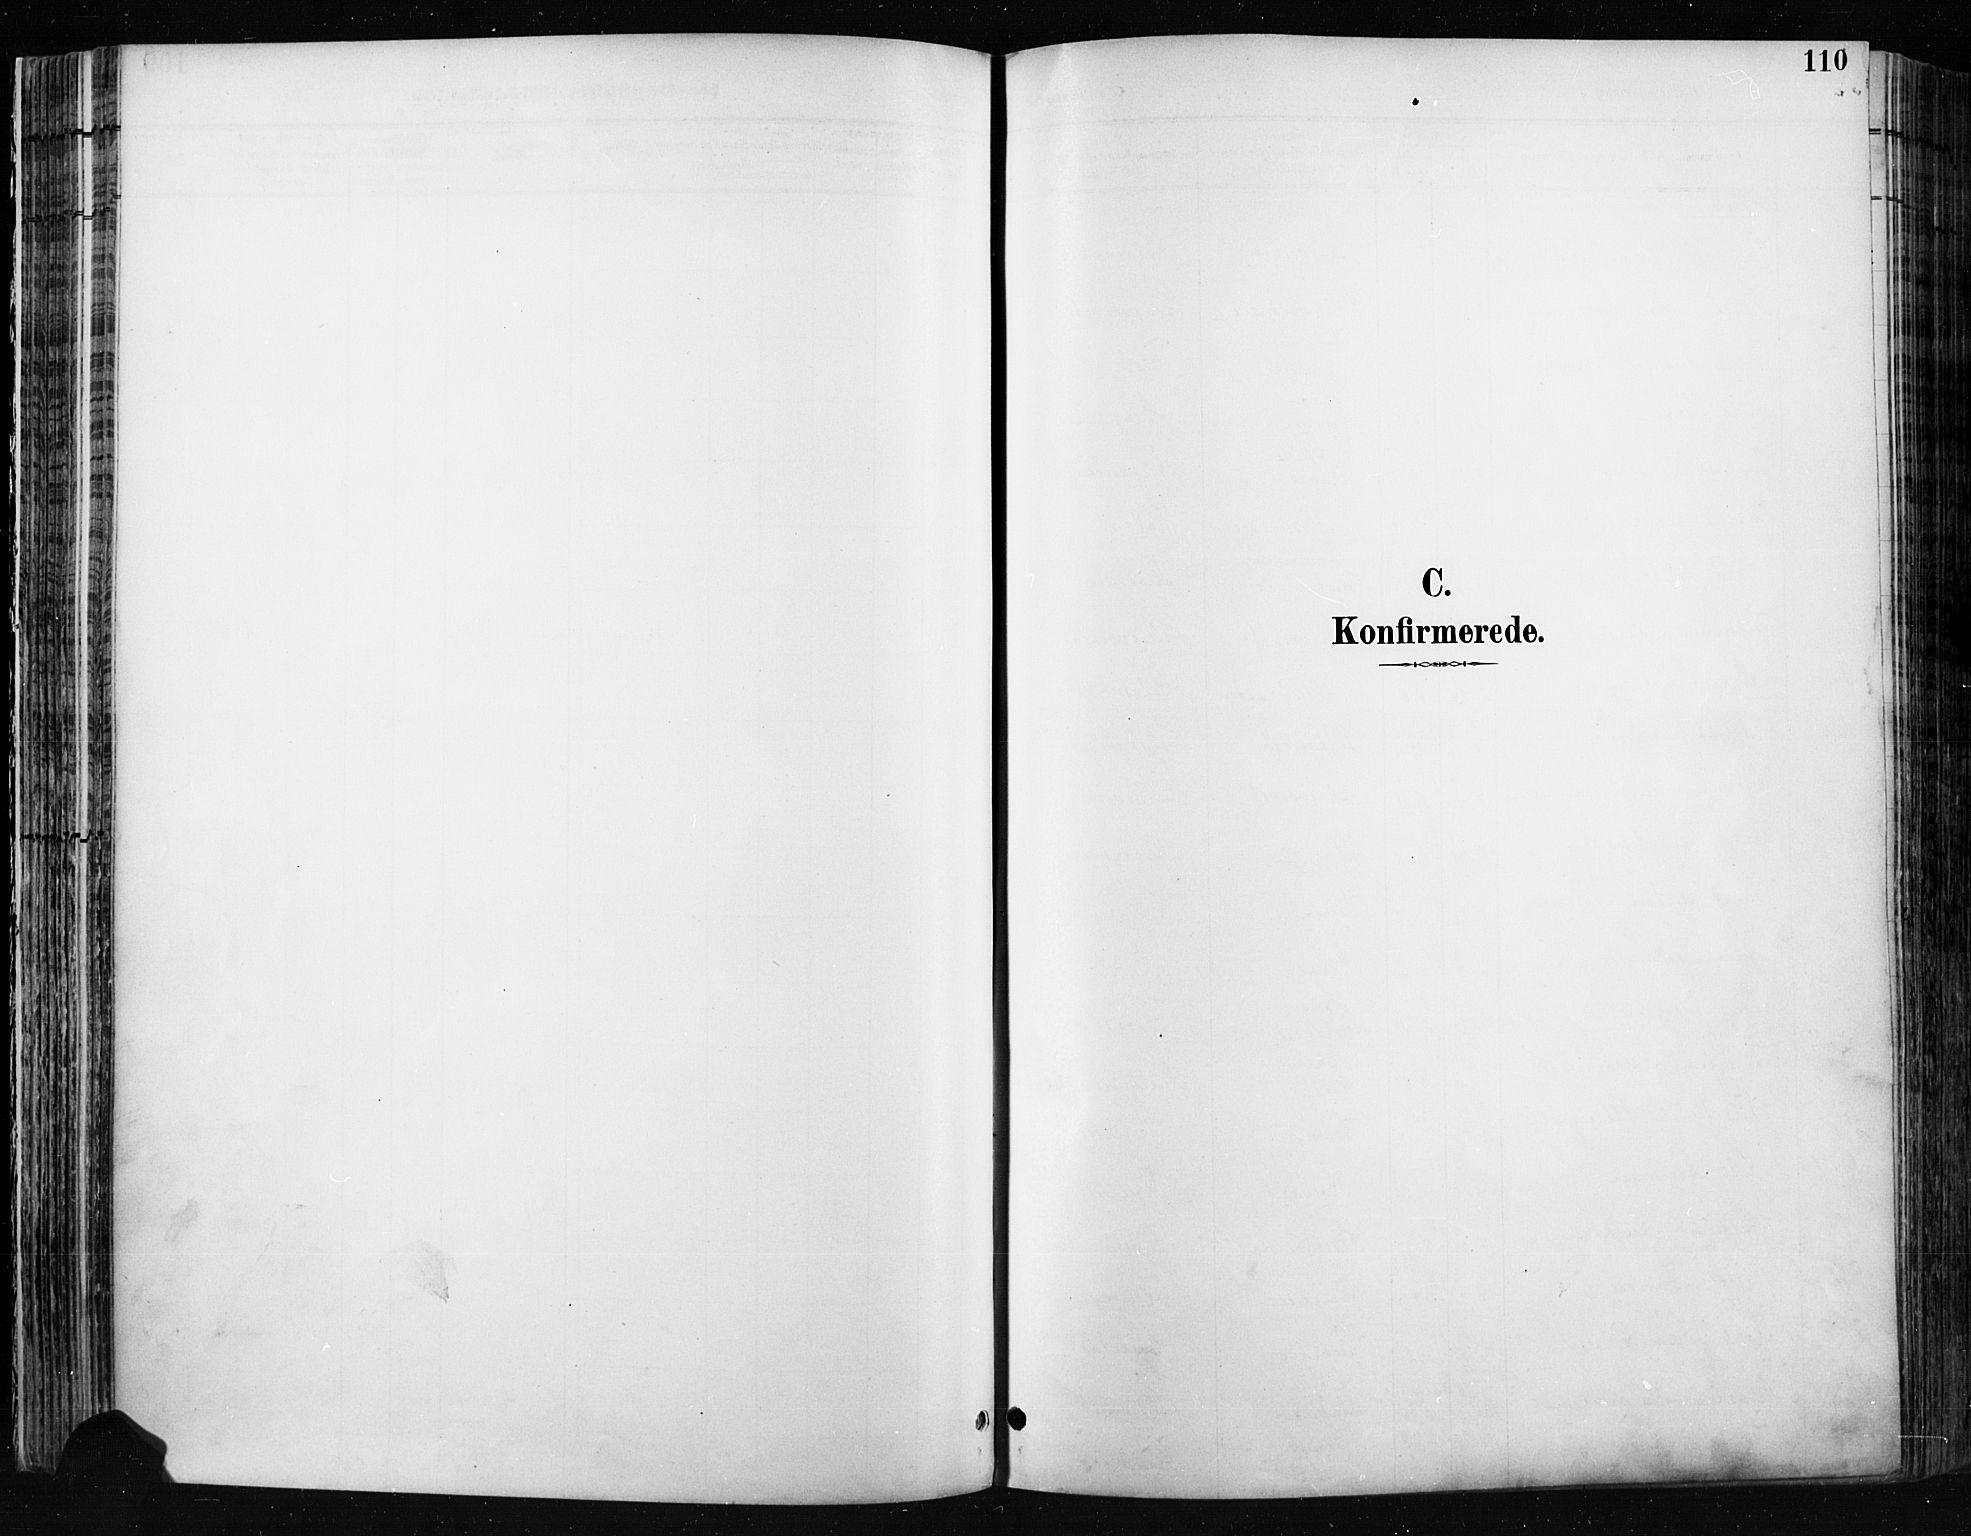 SAH, Jevnaker prestekontor, Ministerialbok nr. 9, 1891-1901, s. 110